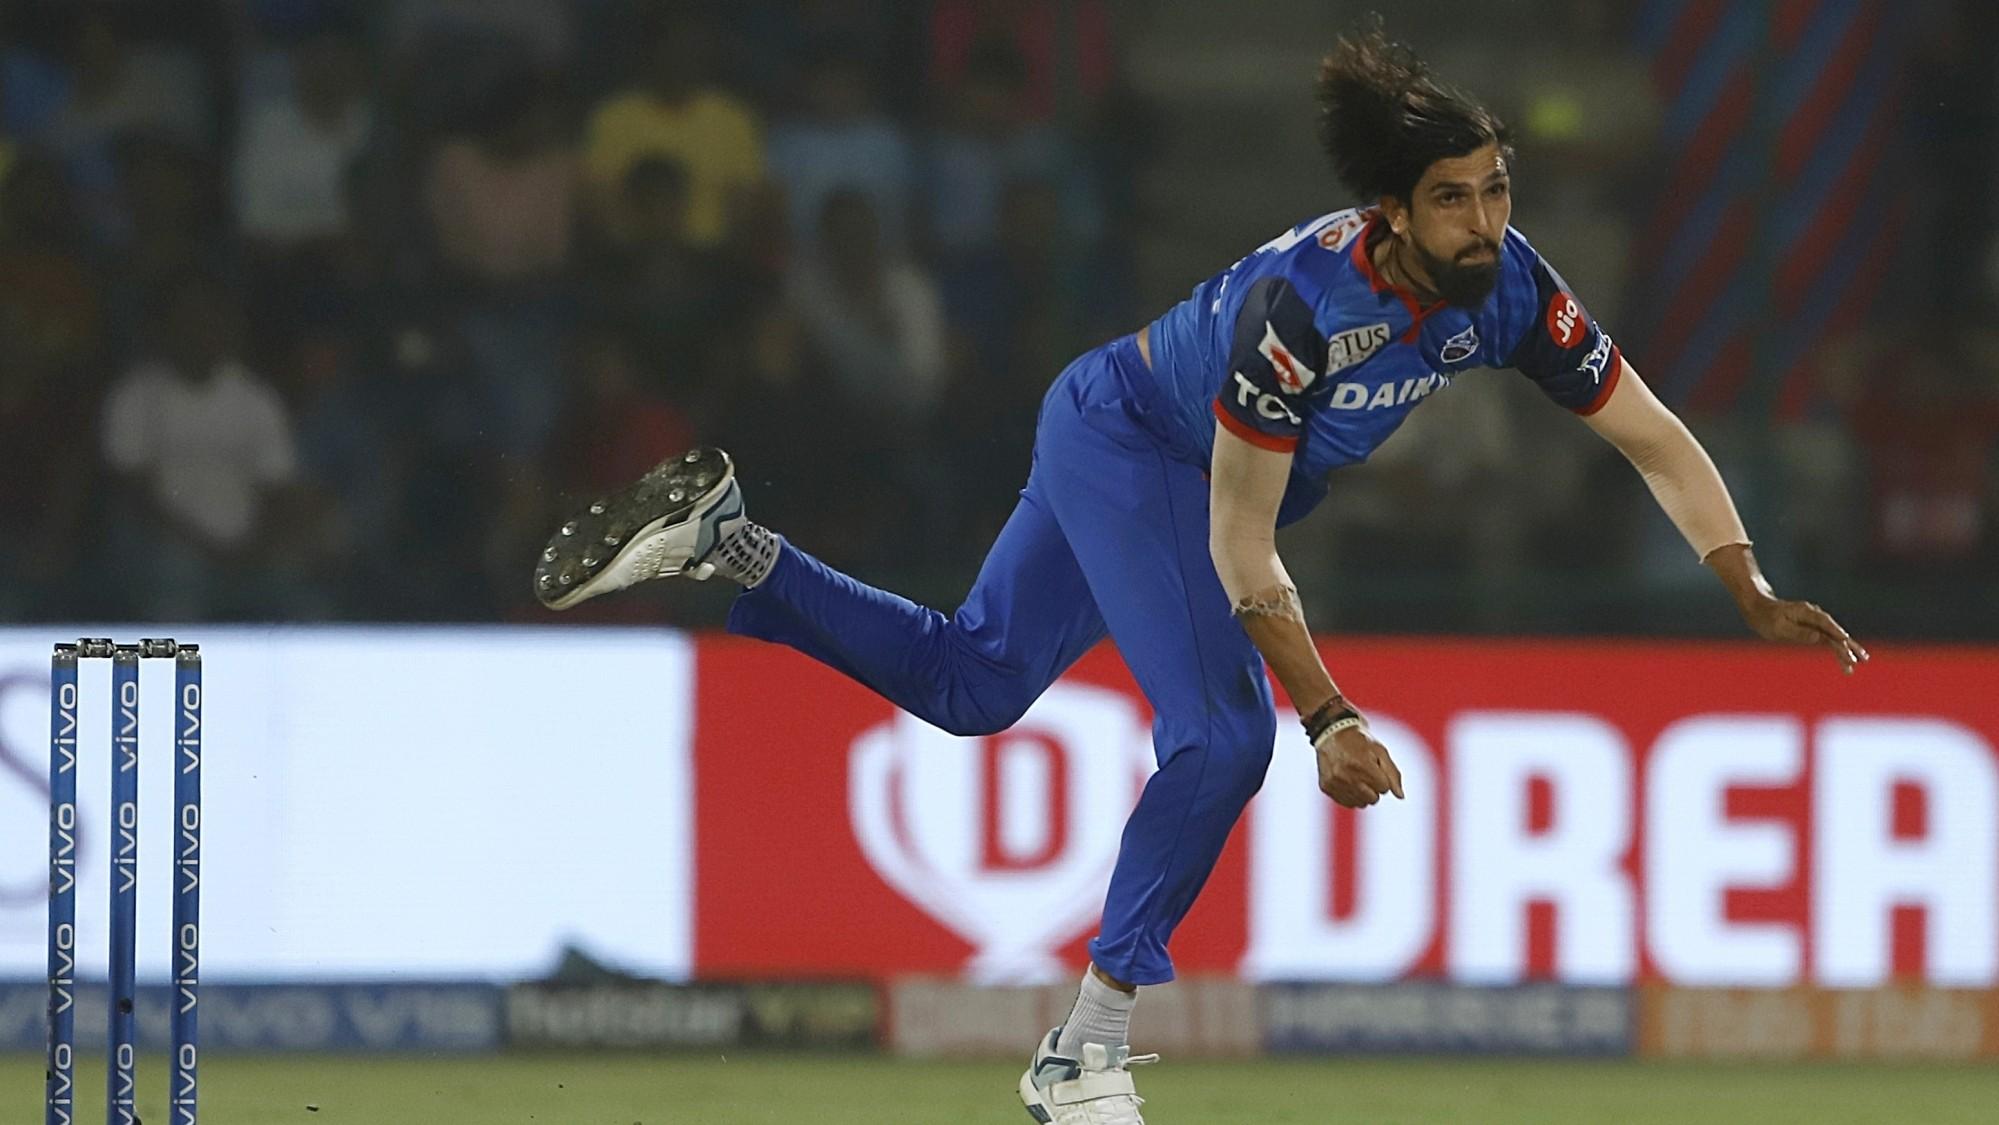 IPL 2020: Ishant Sharma picks up back injury at training ahead of DC's opening game